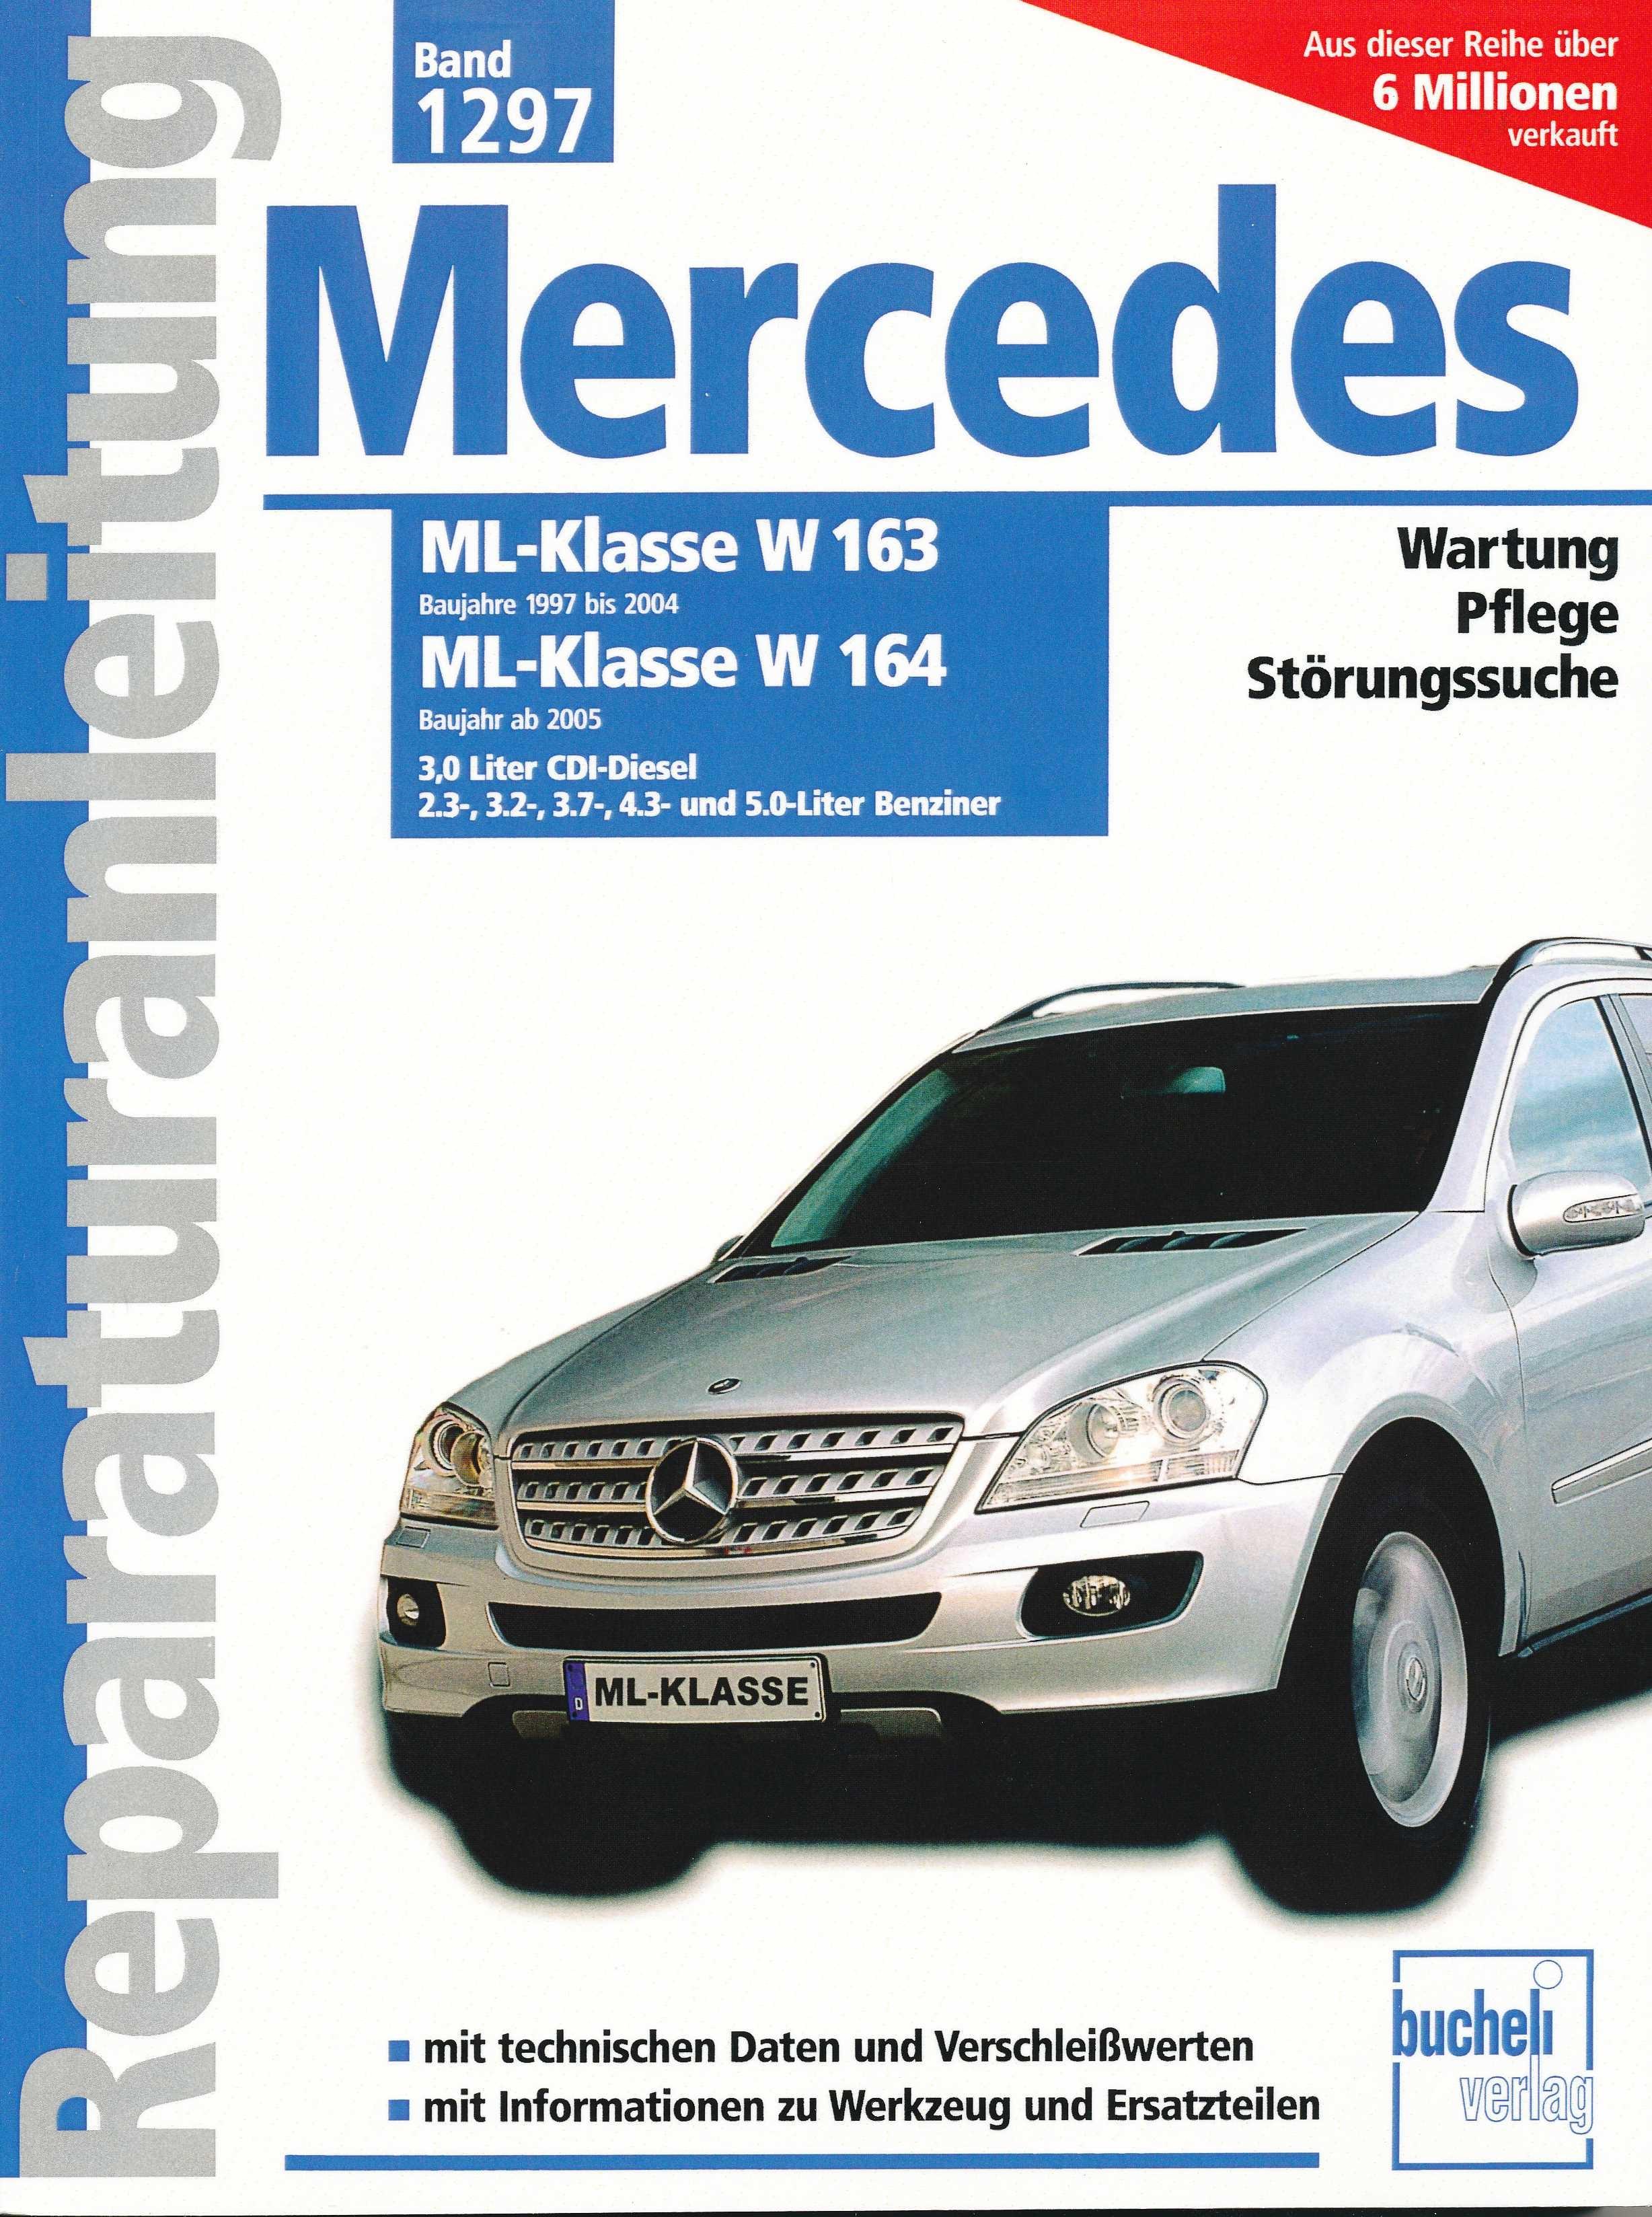 mercedes ml klasse w 163 w 164 1997 2005 reparaturanleitung f r 39 90 beim tec verlag. Black Bedroom Furniture Sets. Home Design Ideas